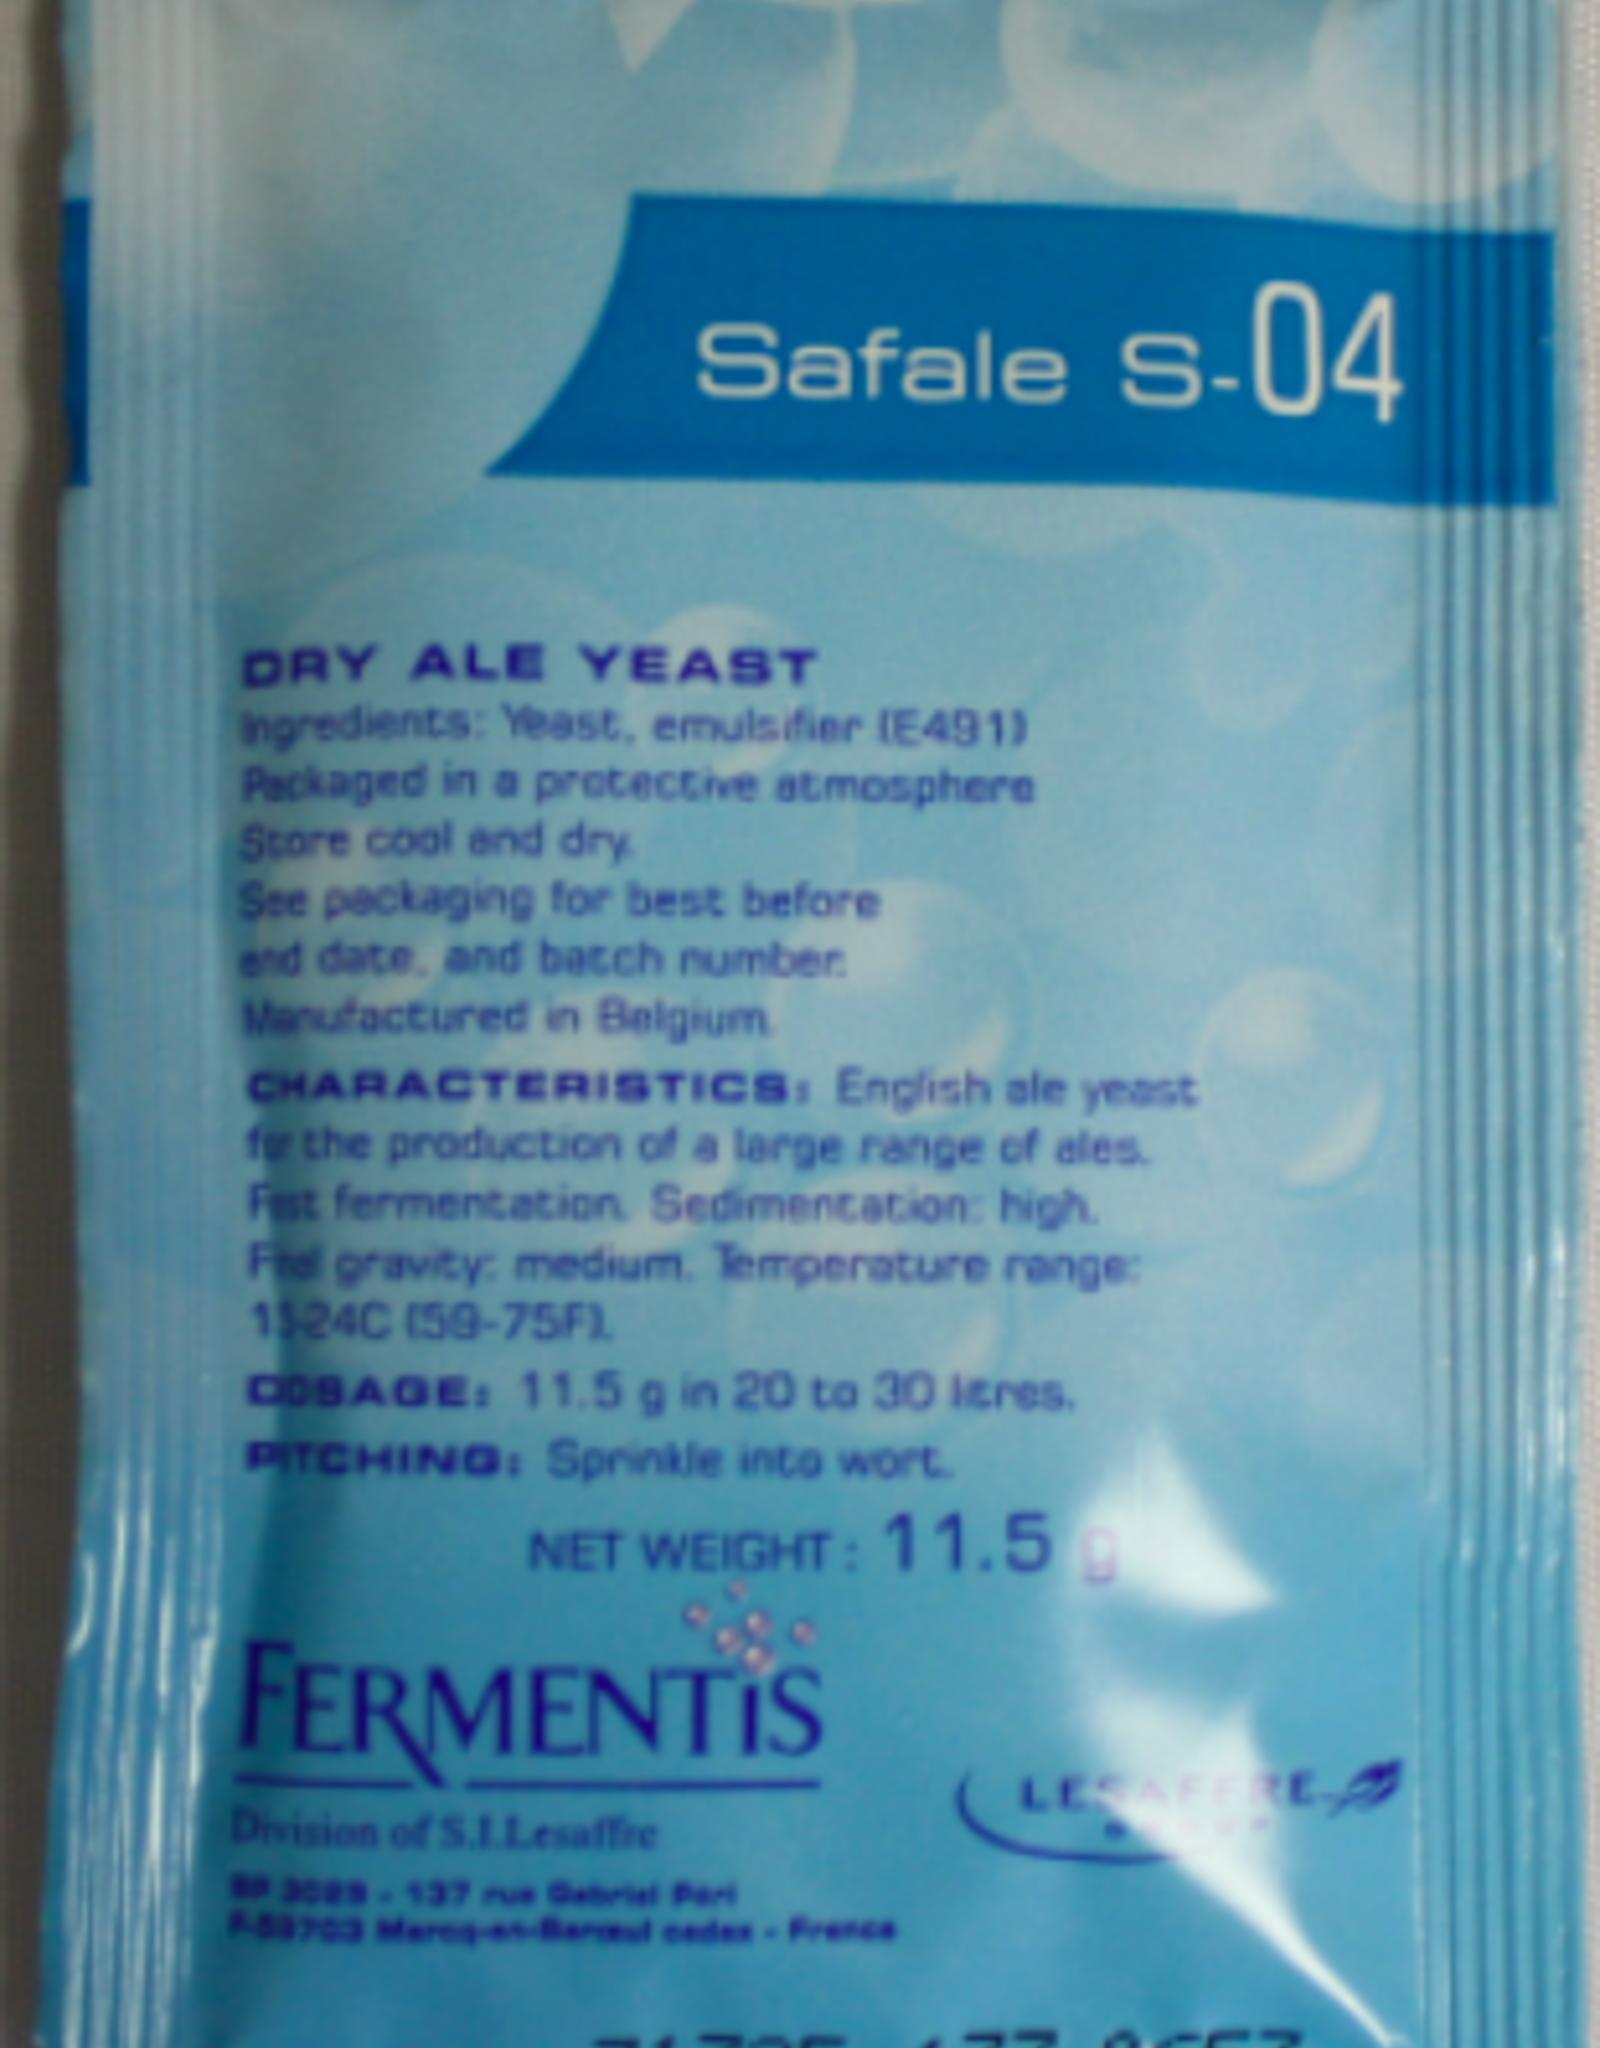 Safale S-04 English Ale Yeast (Fermentis) - 11.5 g